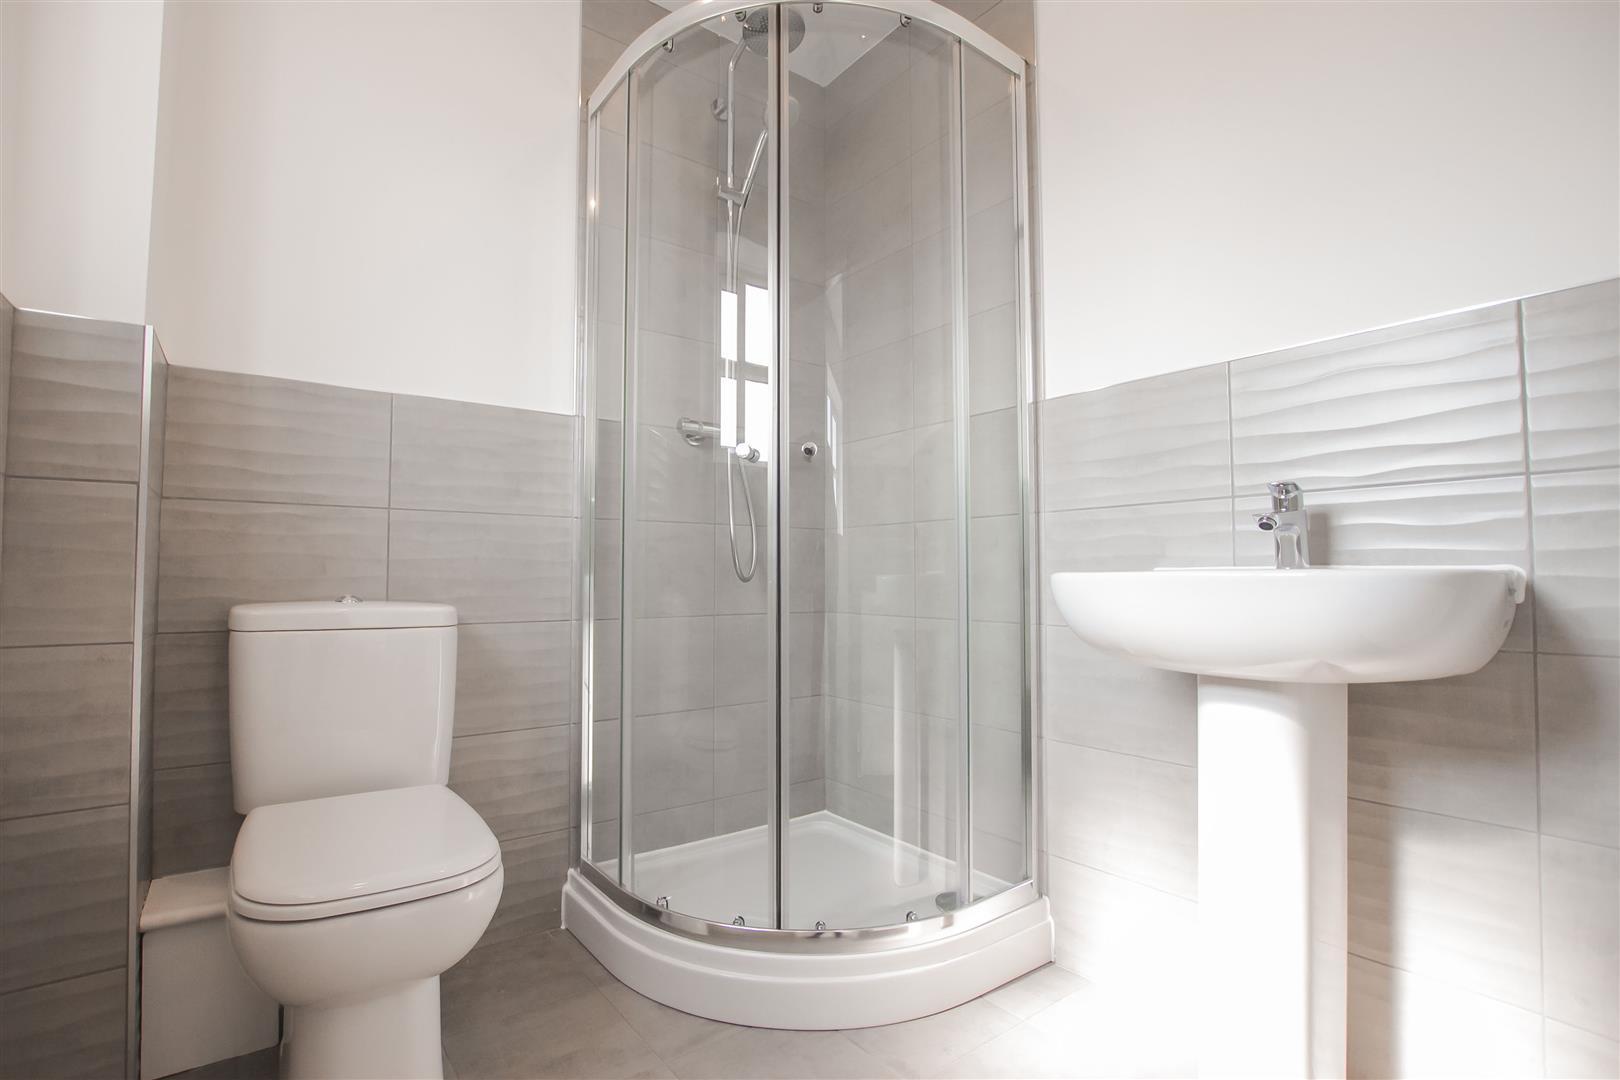 4 Bedroom Detached House For Sale - Show Home En Suite (1).jpg